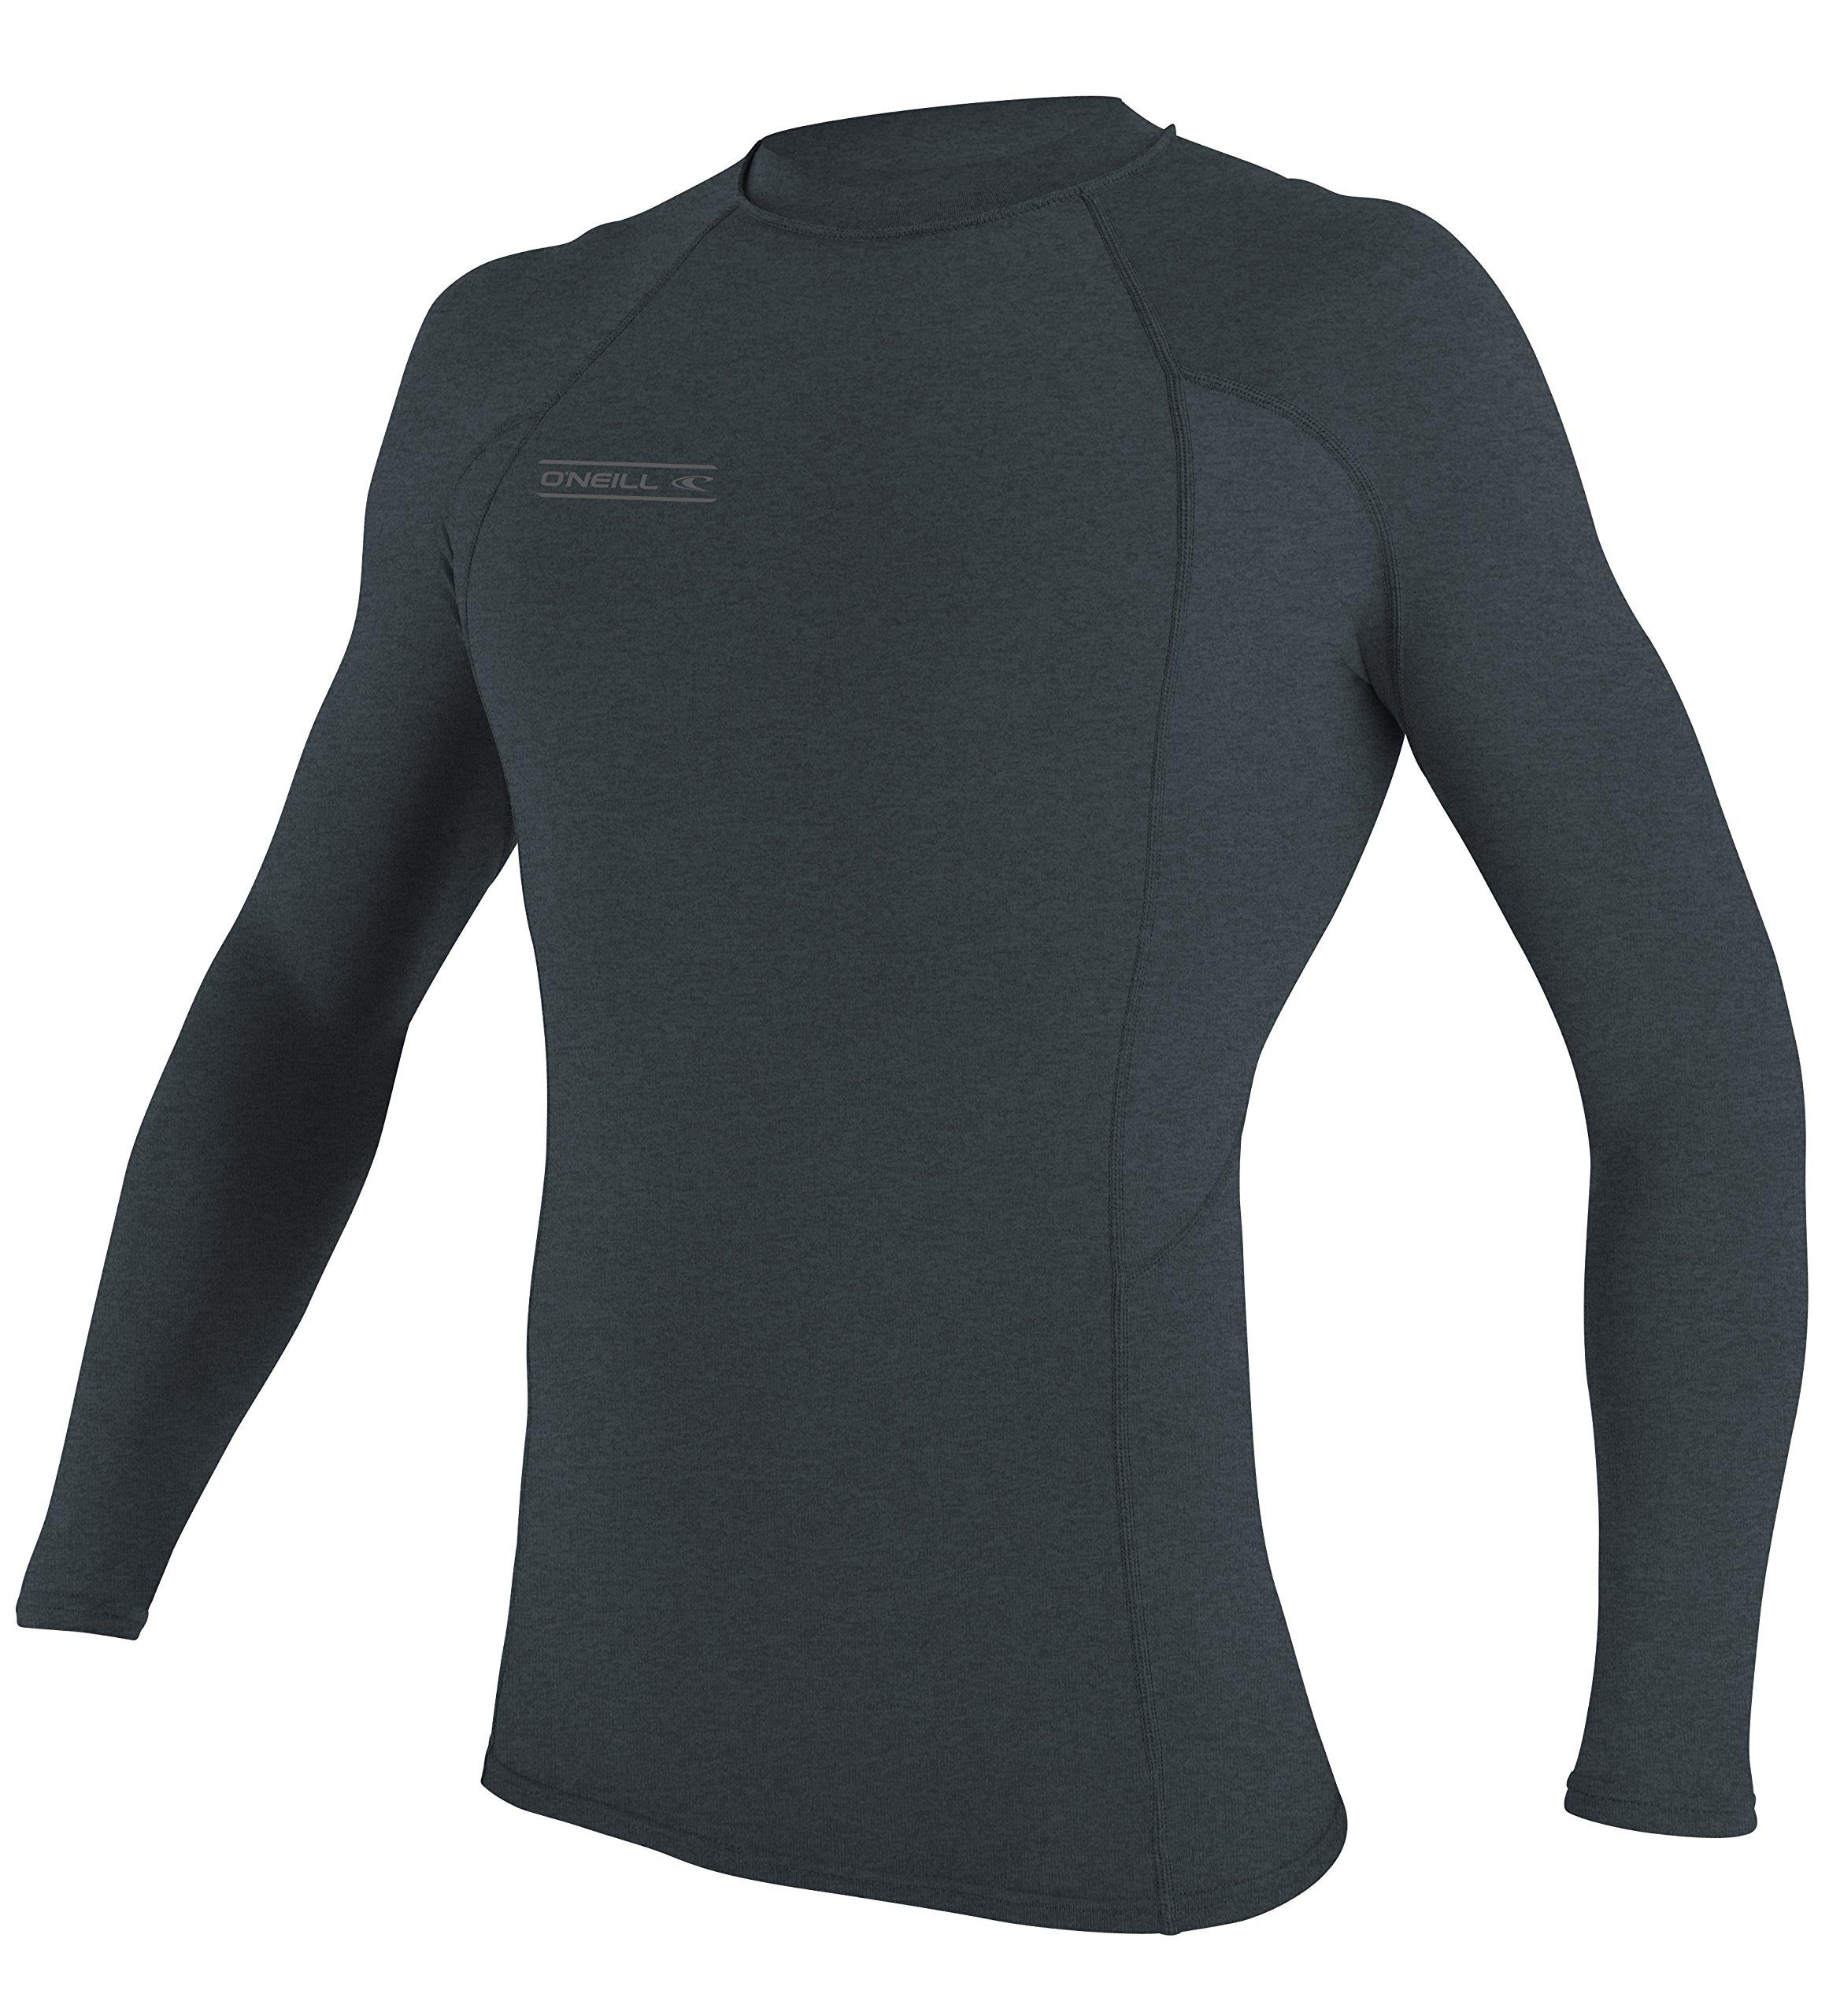 O'Neill UV Sun Protection Men's Basic Skins Long Sleeve Crew Rashguard, Blue Dim Slate, Large